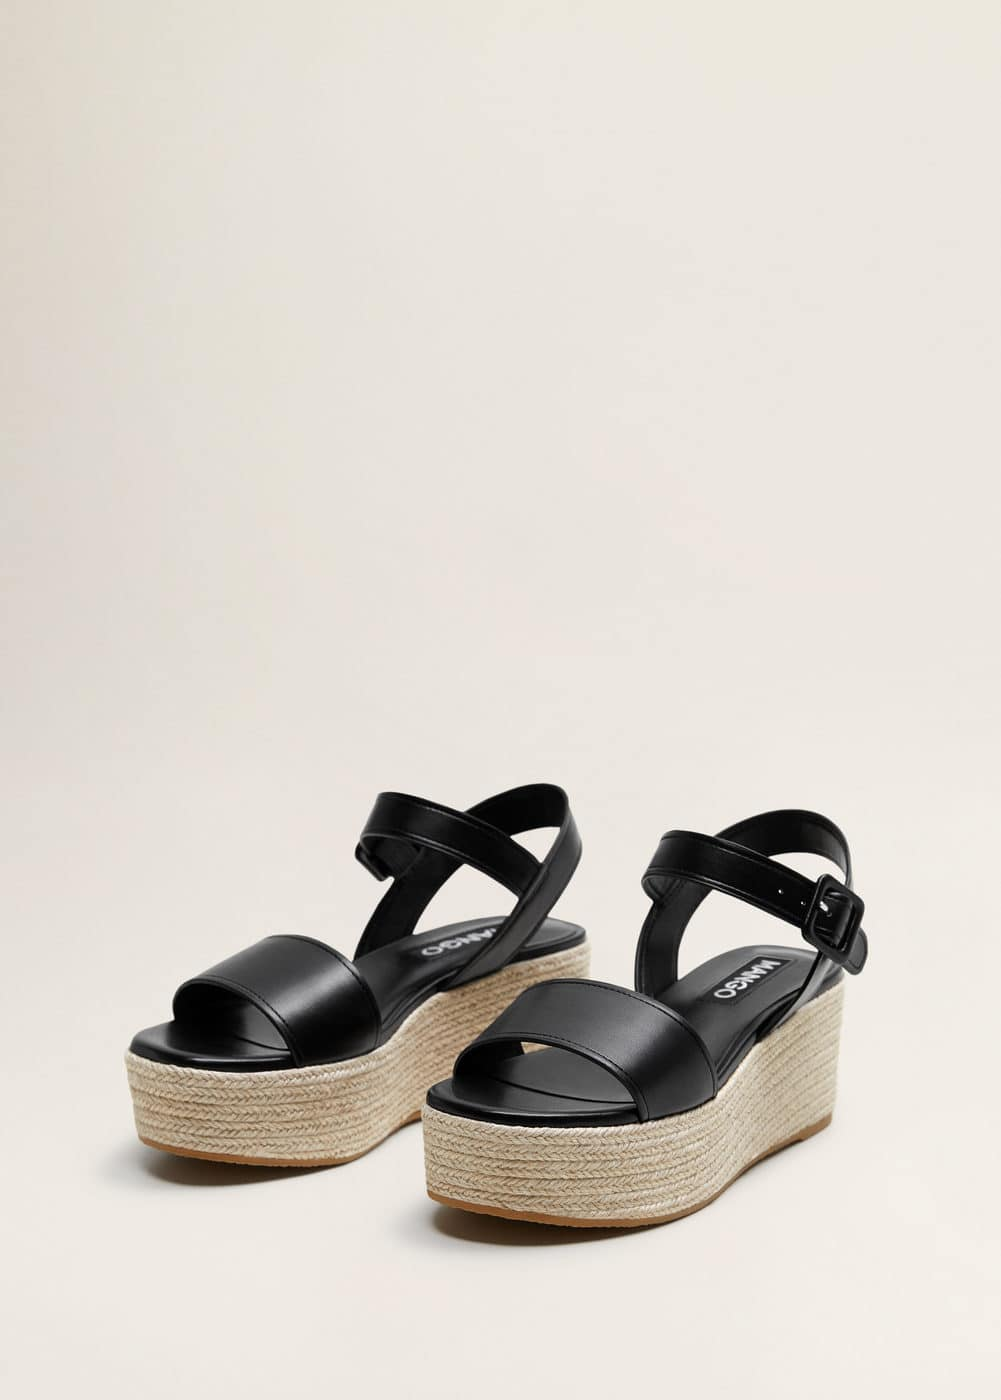 Wedge Republic Braided Sandals WomanMango Czech 34RjqA5L